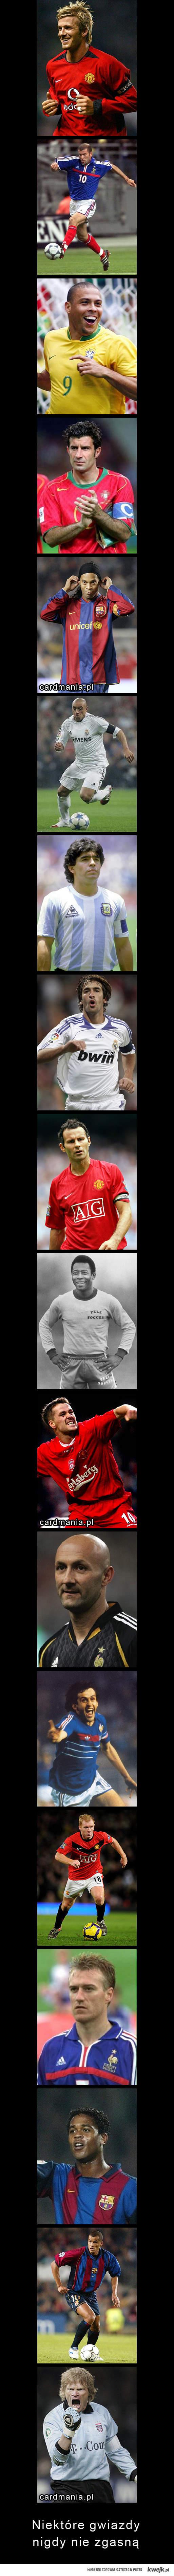 Piłkarskie legendy